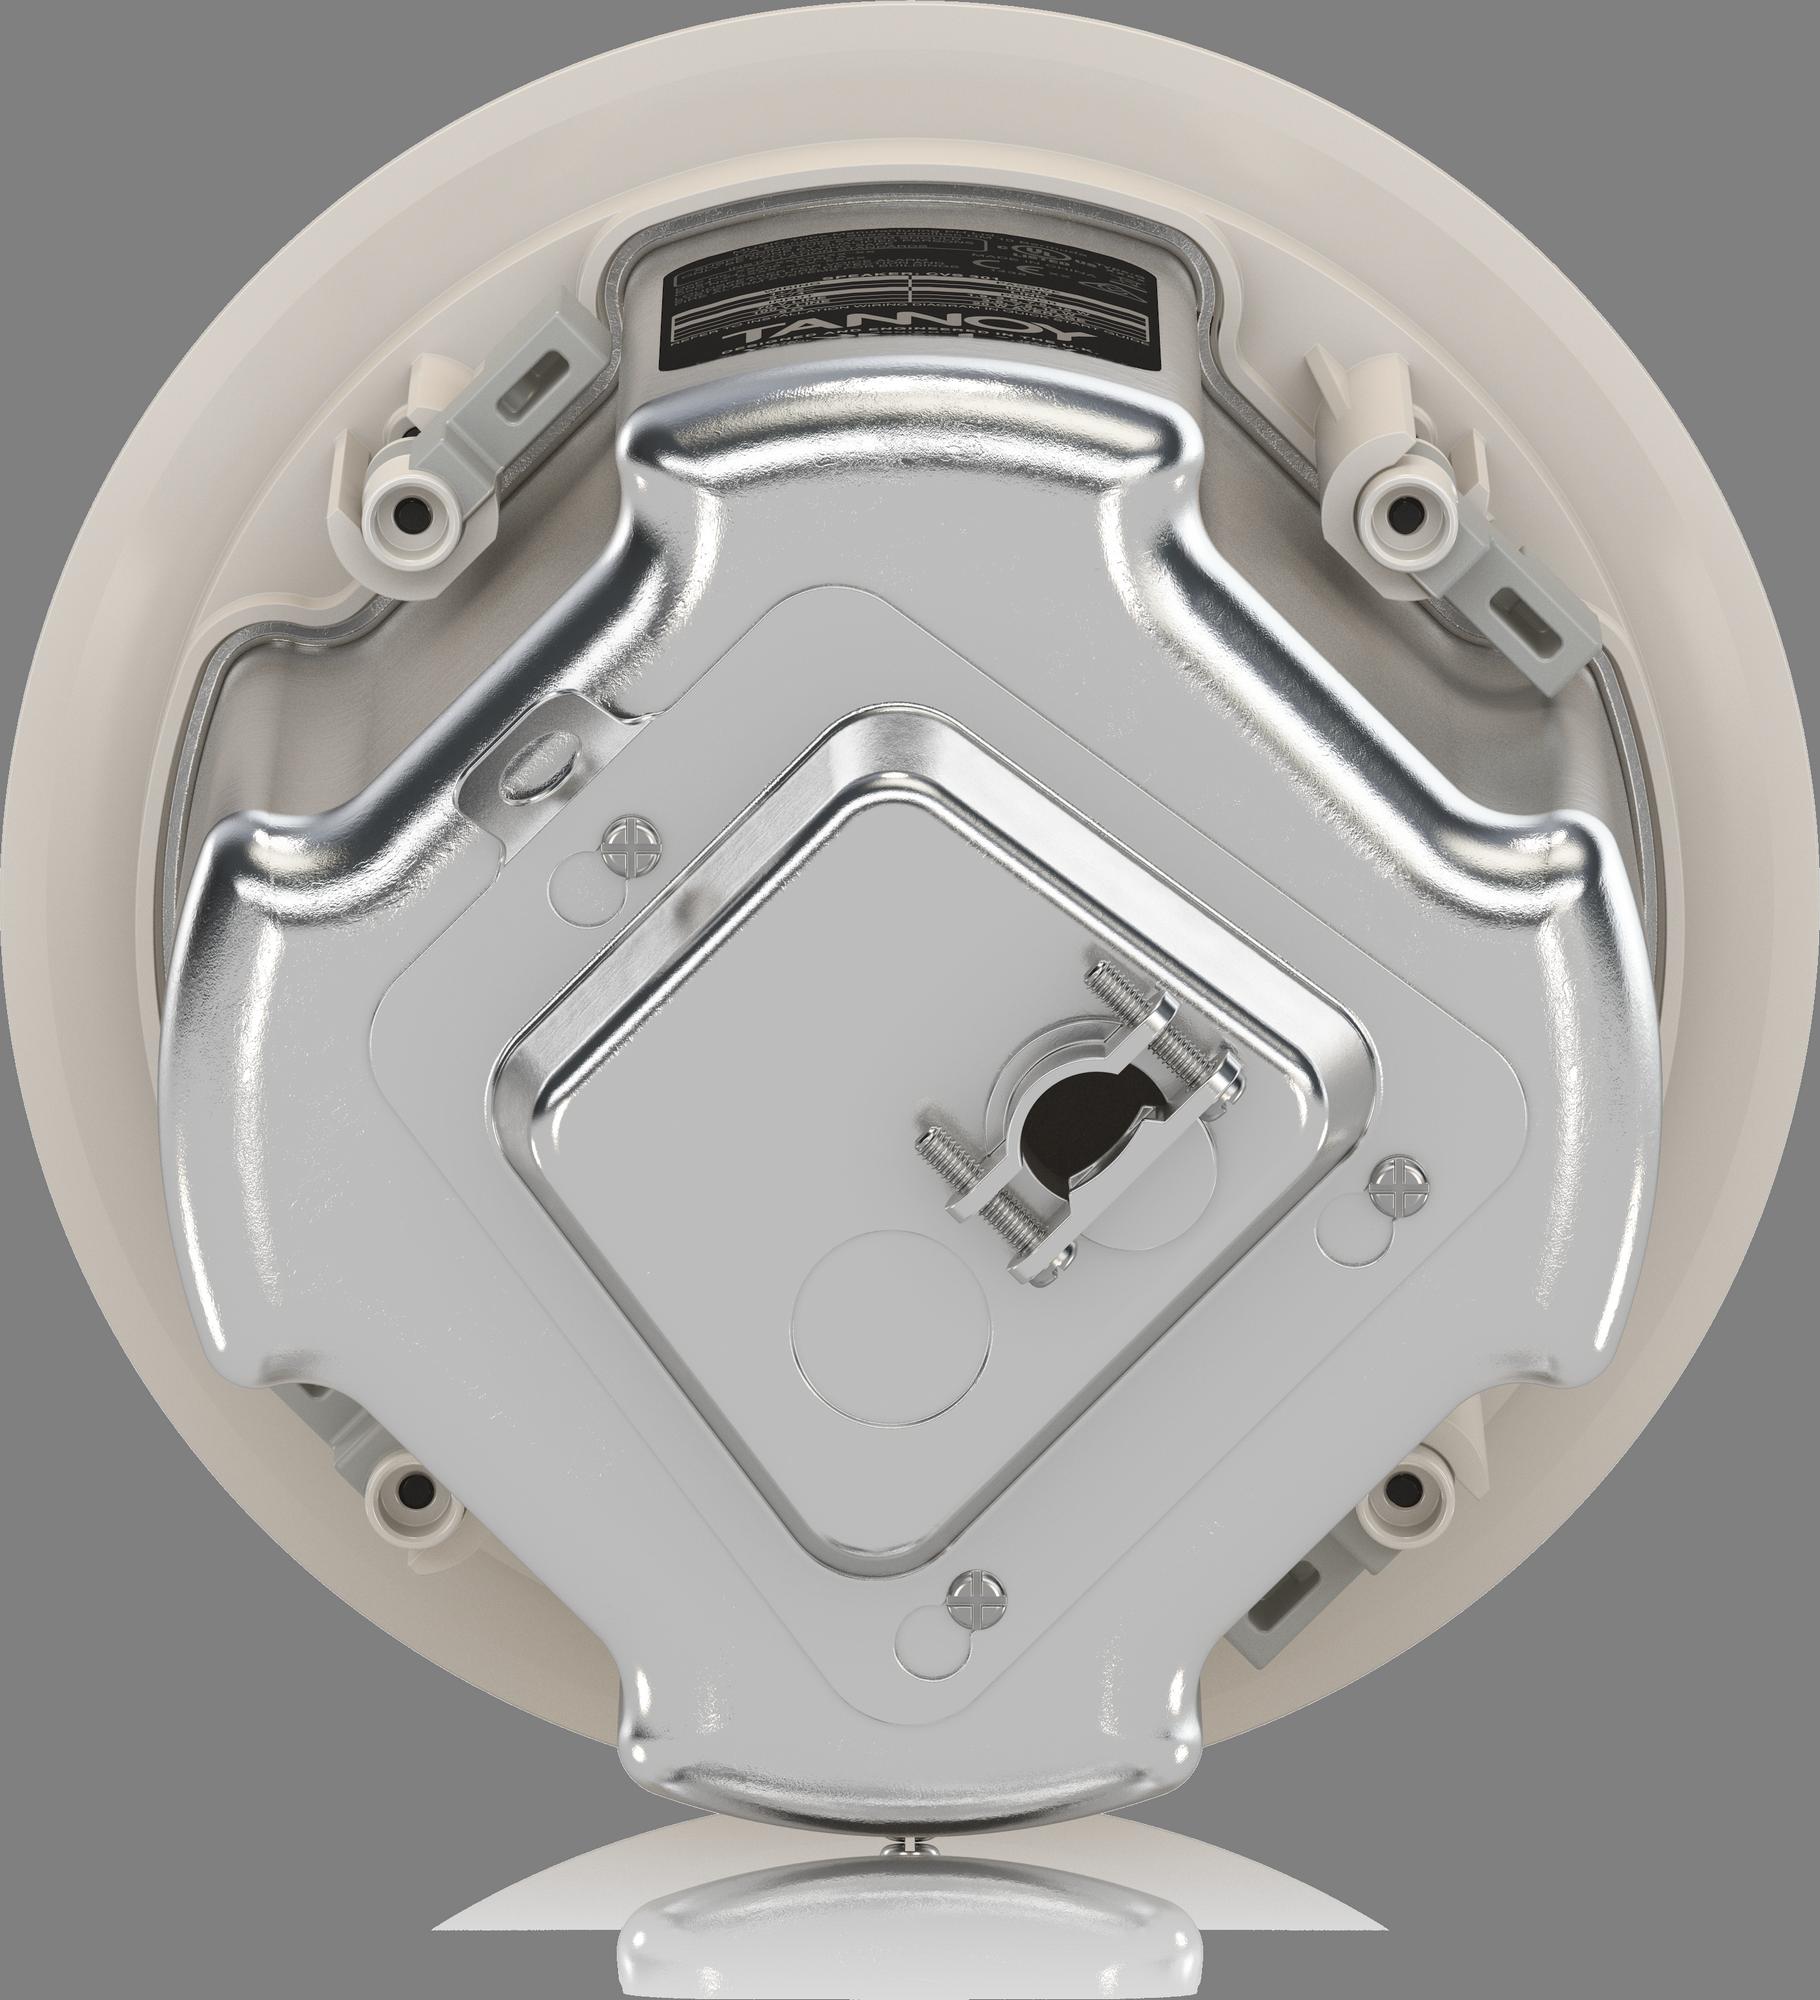 Tannoy  CVS 301 - Haut parleur d'installation